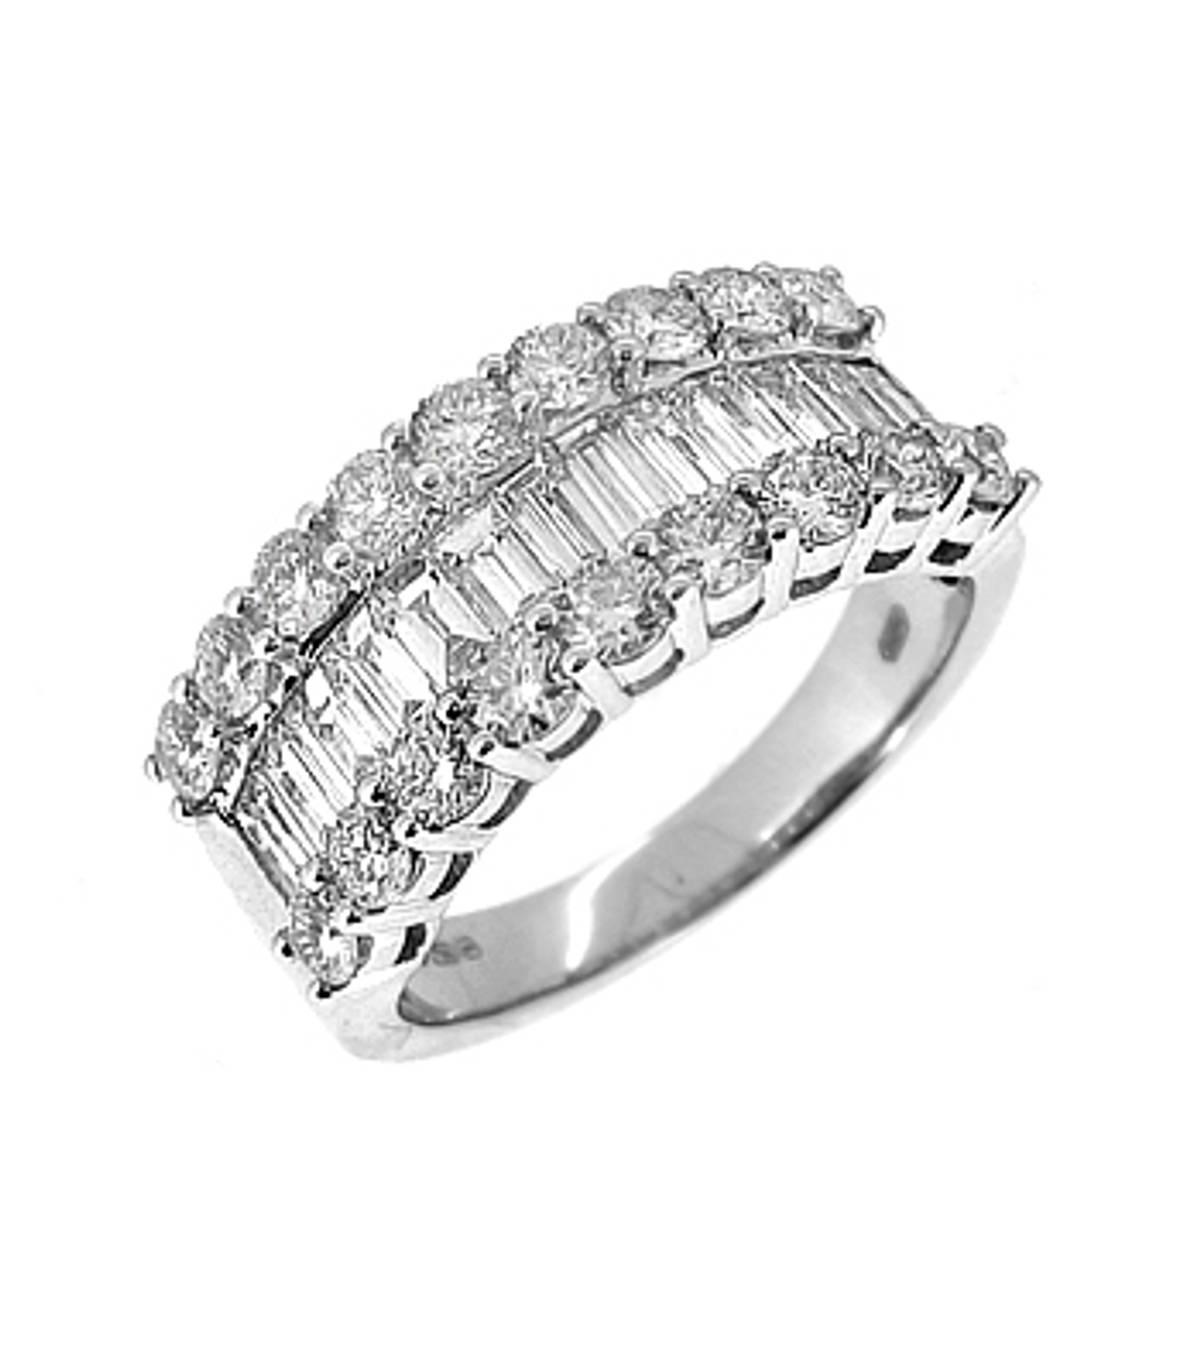 3 ROW DIAMOND DRESS RING 18k white gold baguette & brilliant cut diamond 3 row dress ringDETAILSCarat: diamond total weight 1.91ctsCut: Brilliant cut and BaguetteMetal: 18k white gold